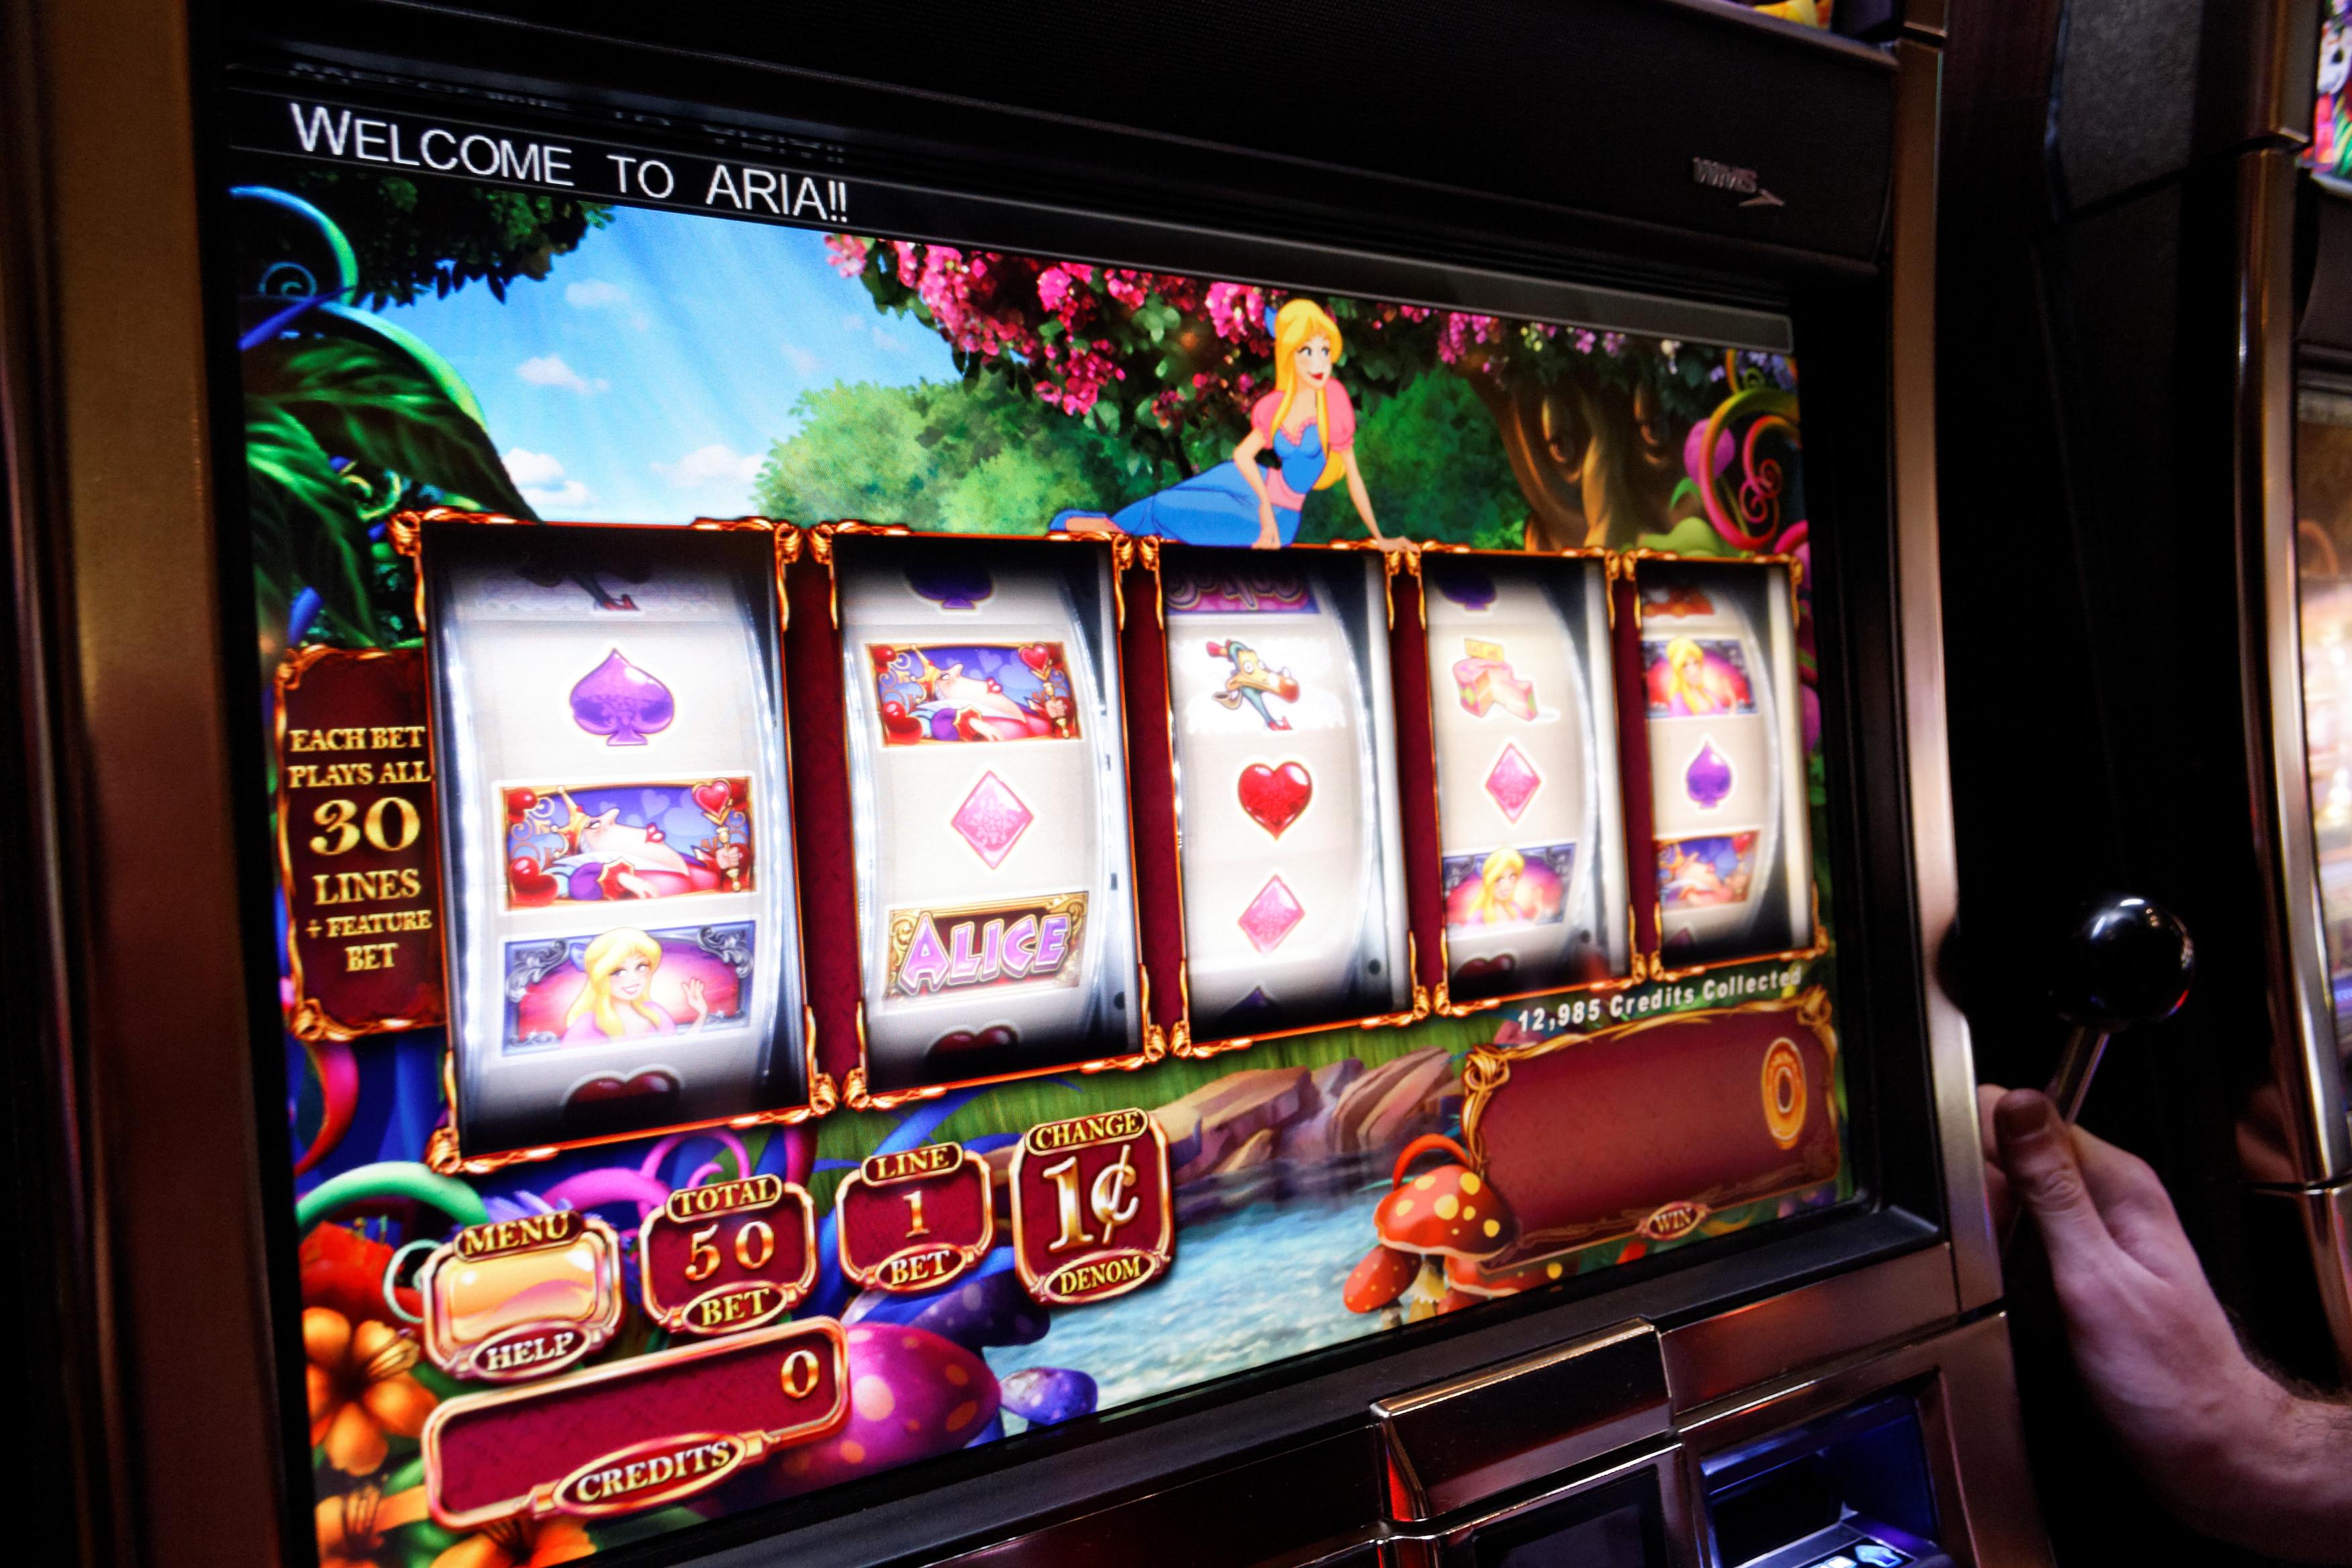 Lotta alle slot machine